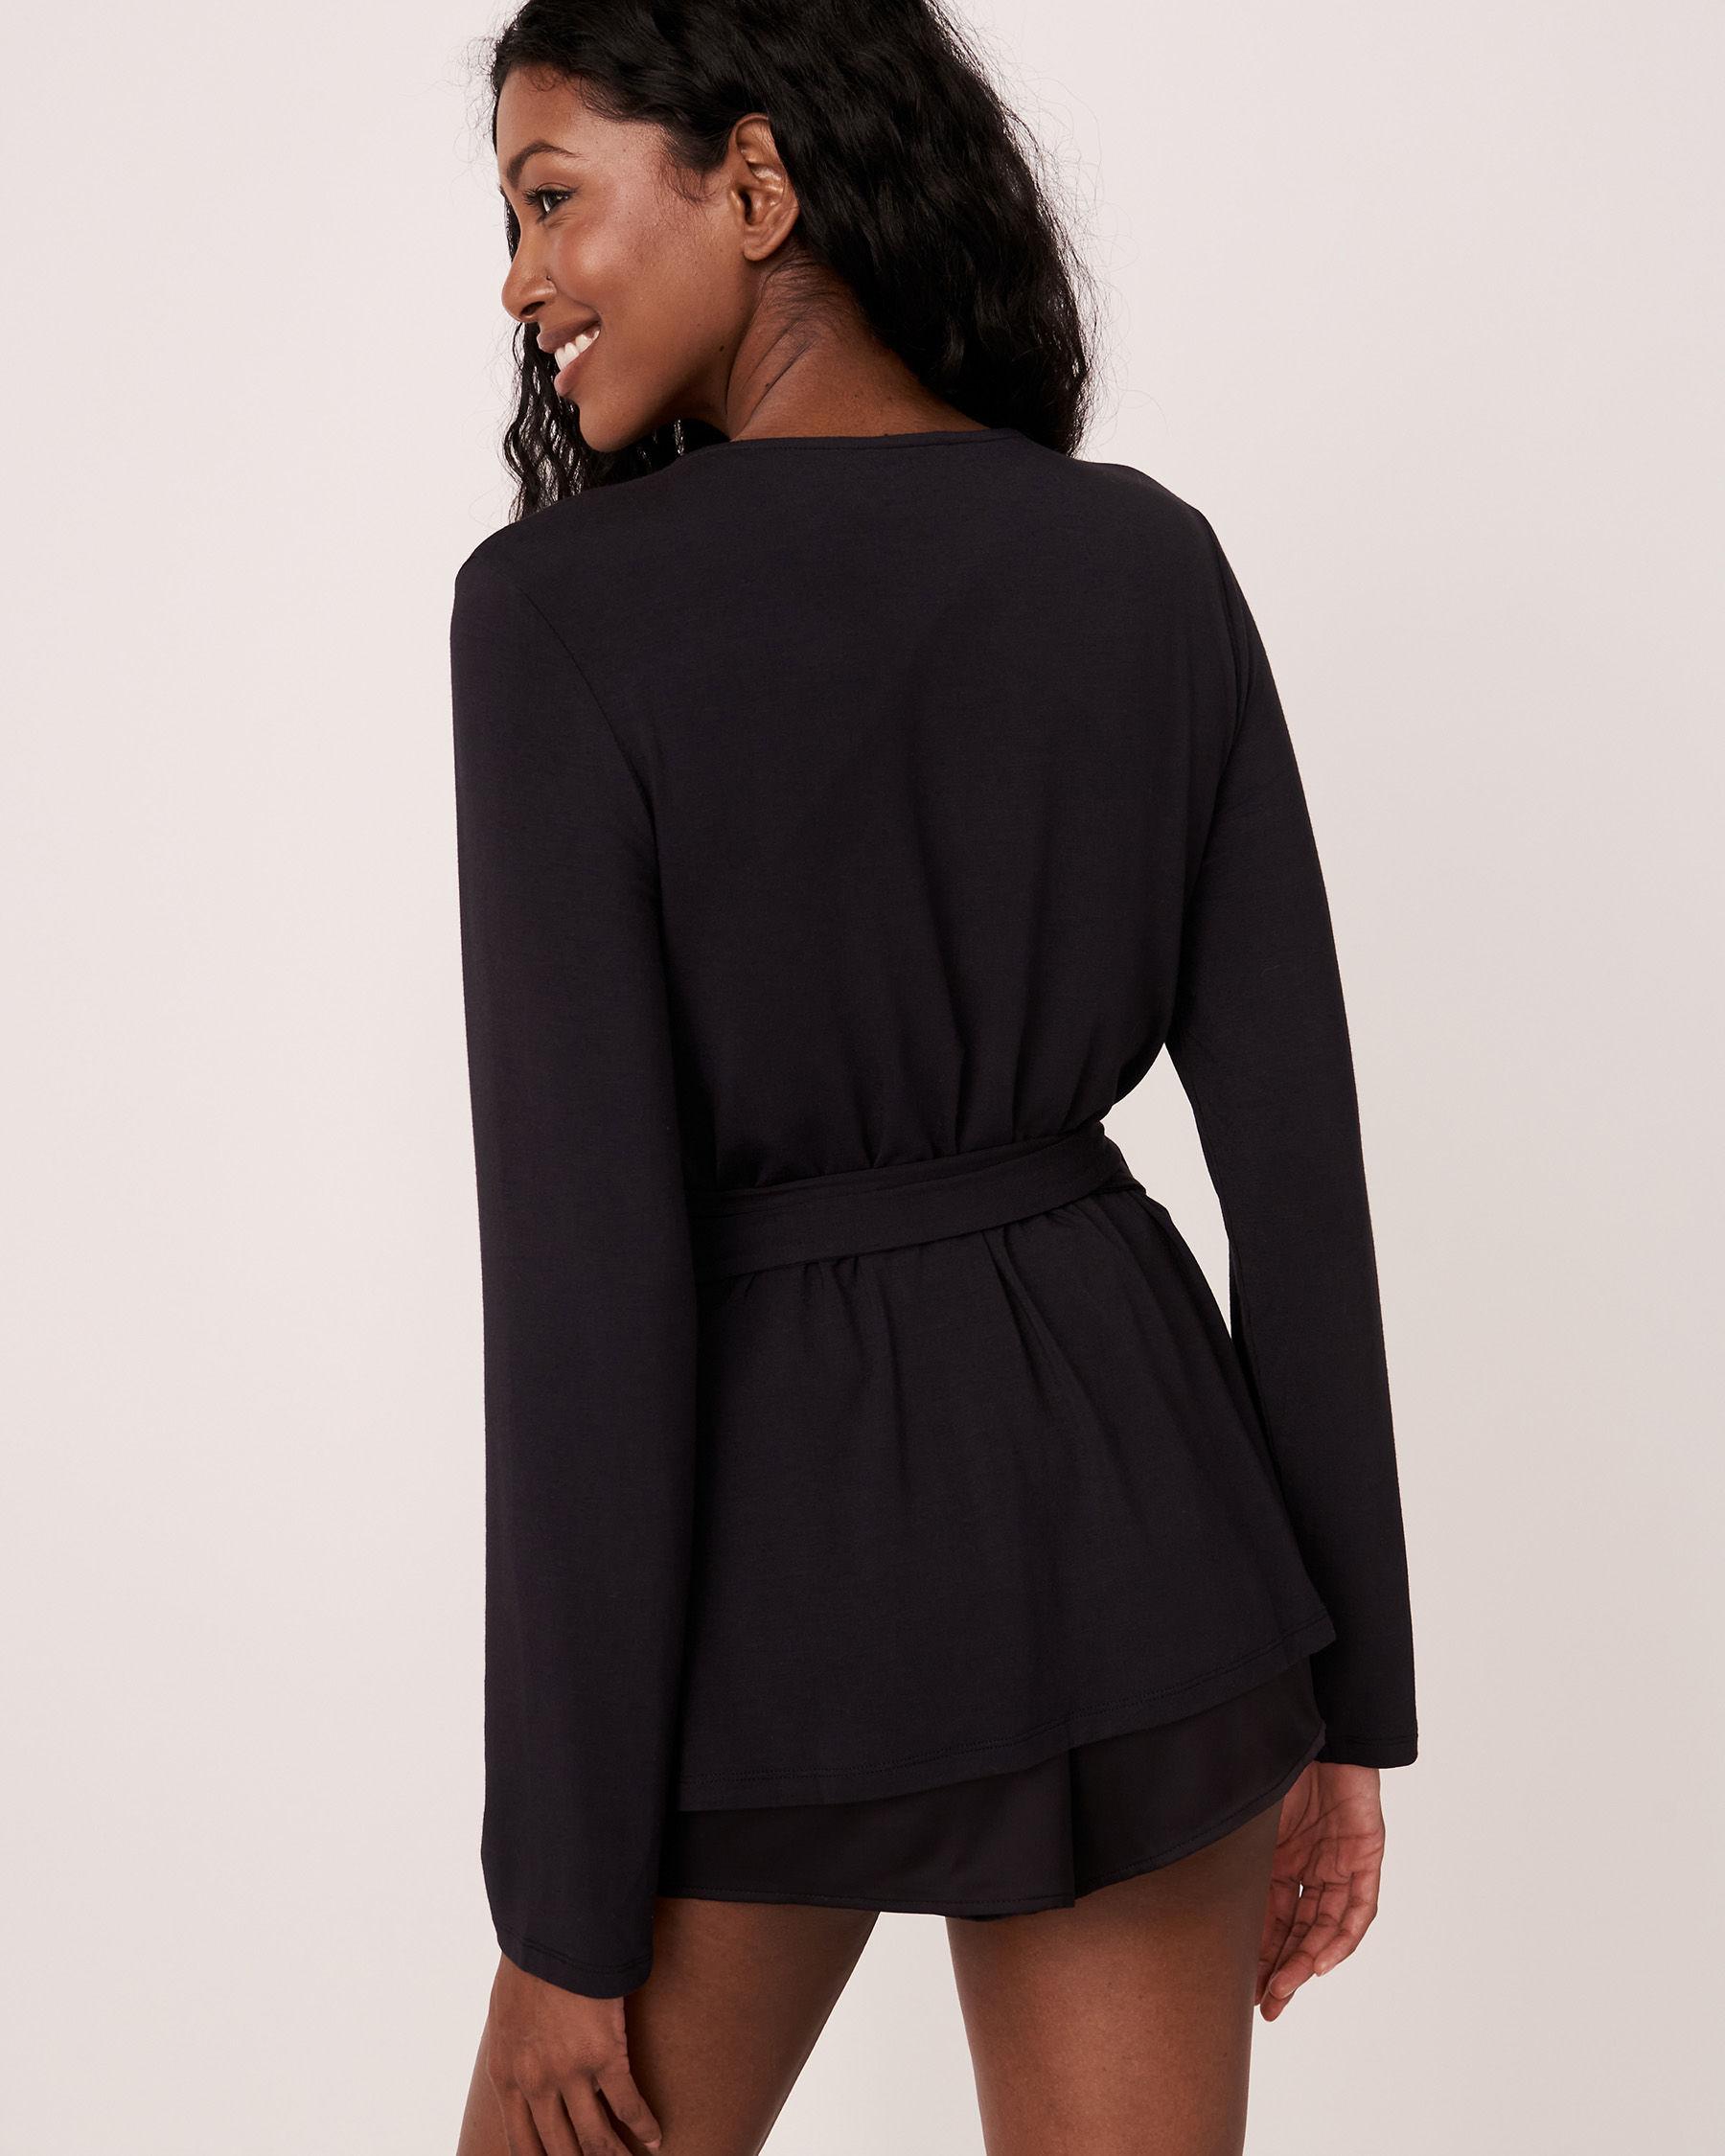 LA VIE EN ROSE Modal Wrap Over Long Sleeve Shirt Black 40100157 - View3